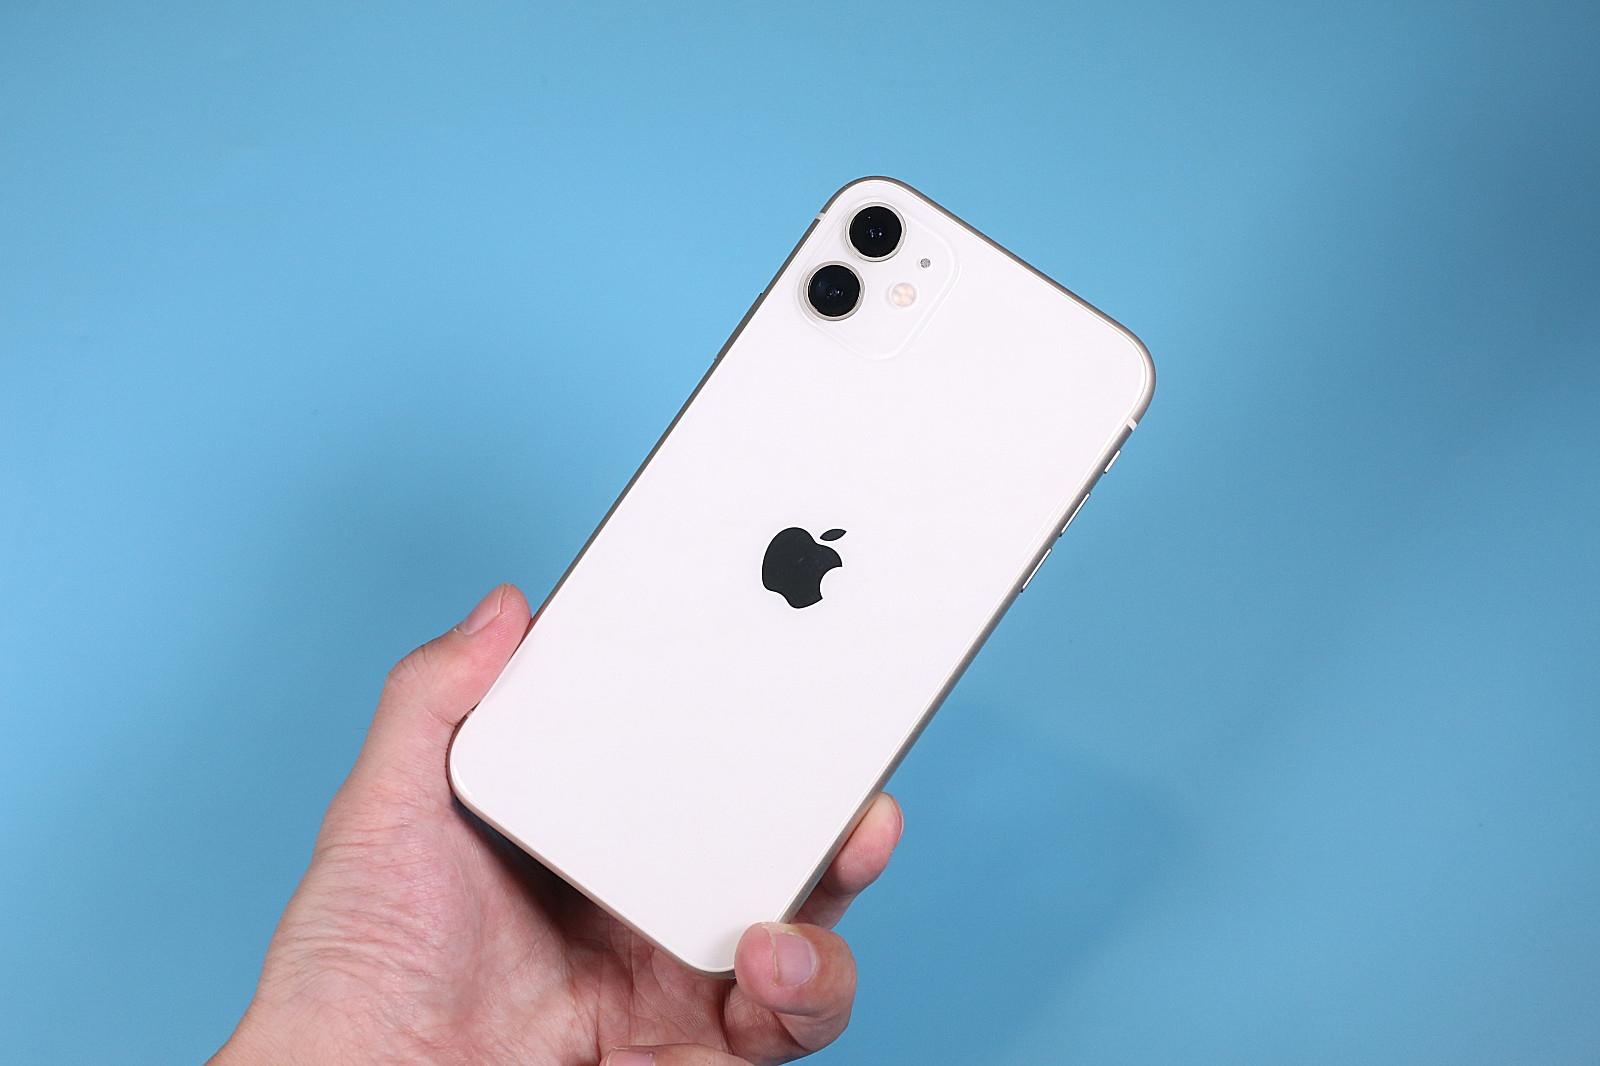 iPhone印度工厂被打砸抢 纬创表态:损失没那么大